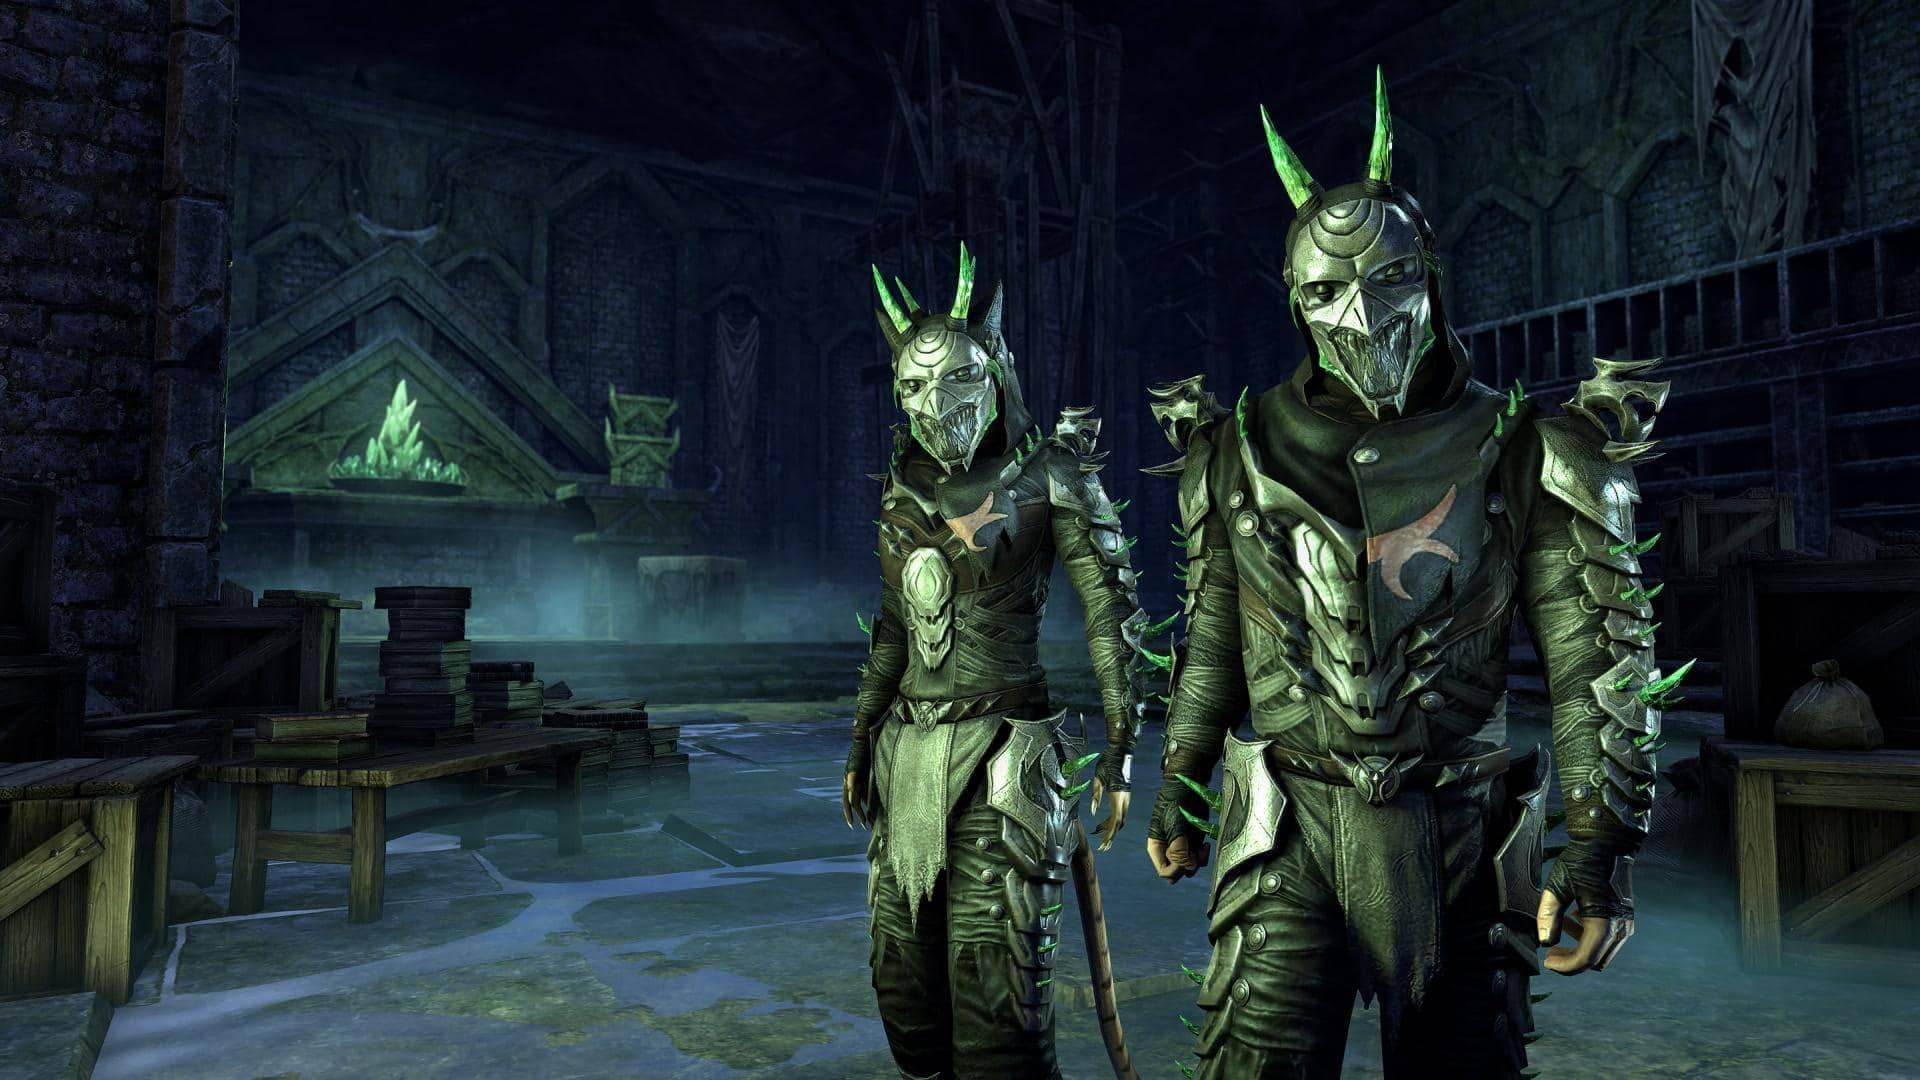 Elder Scrolls Online Announces November Crown Store Showcase